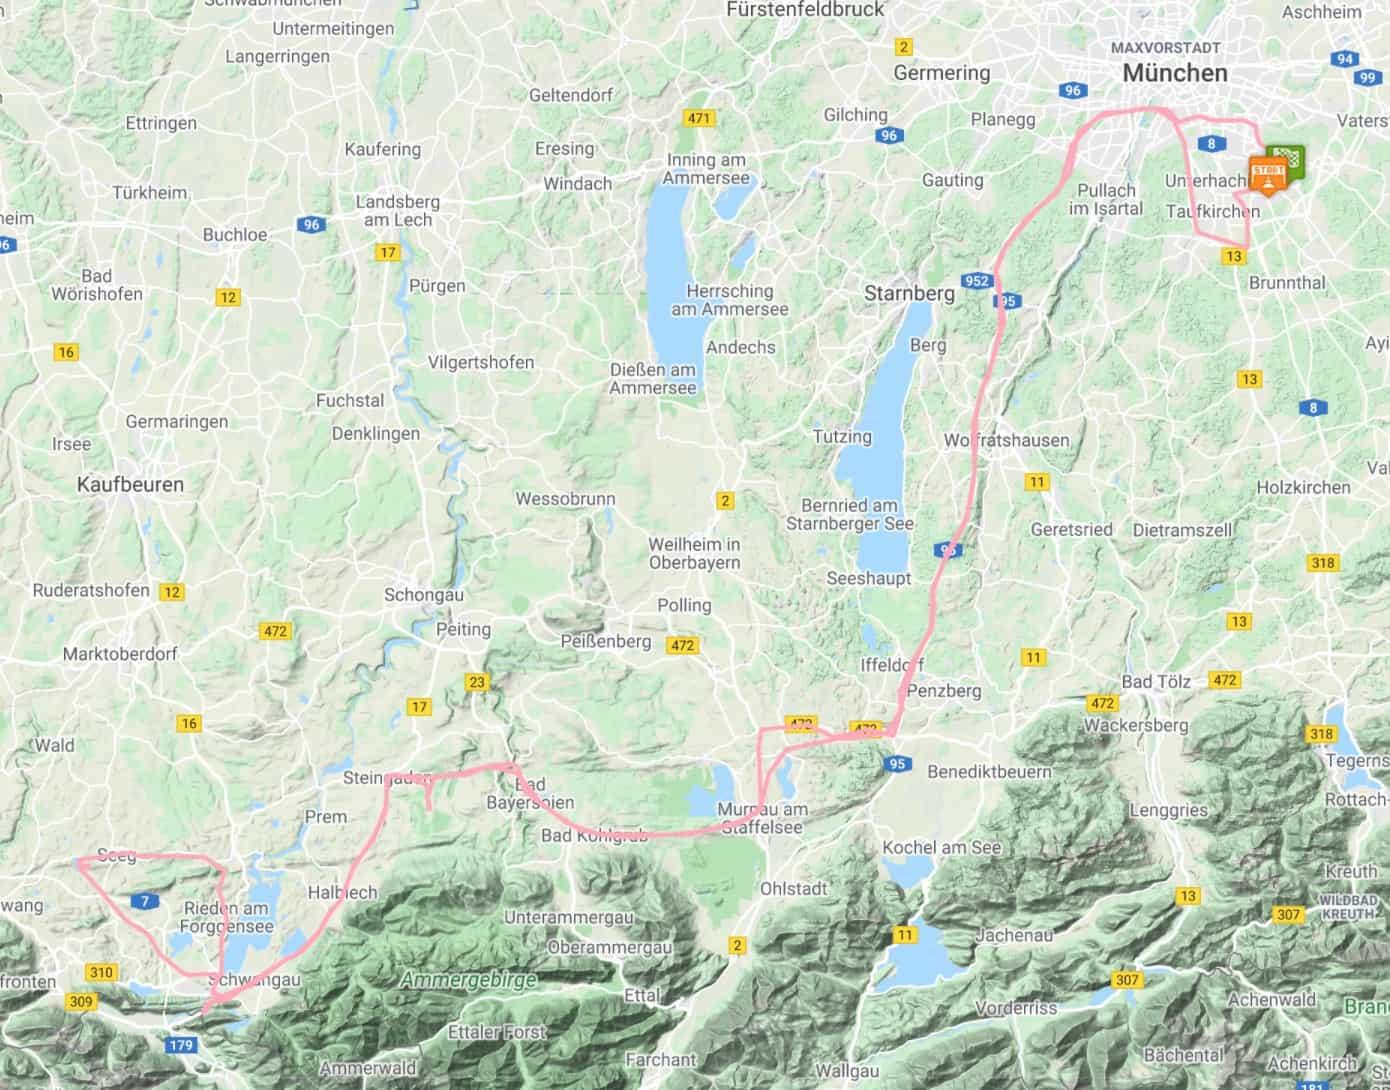 GPS_Tracks_22_05_2020-24_05_2020